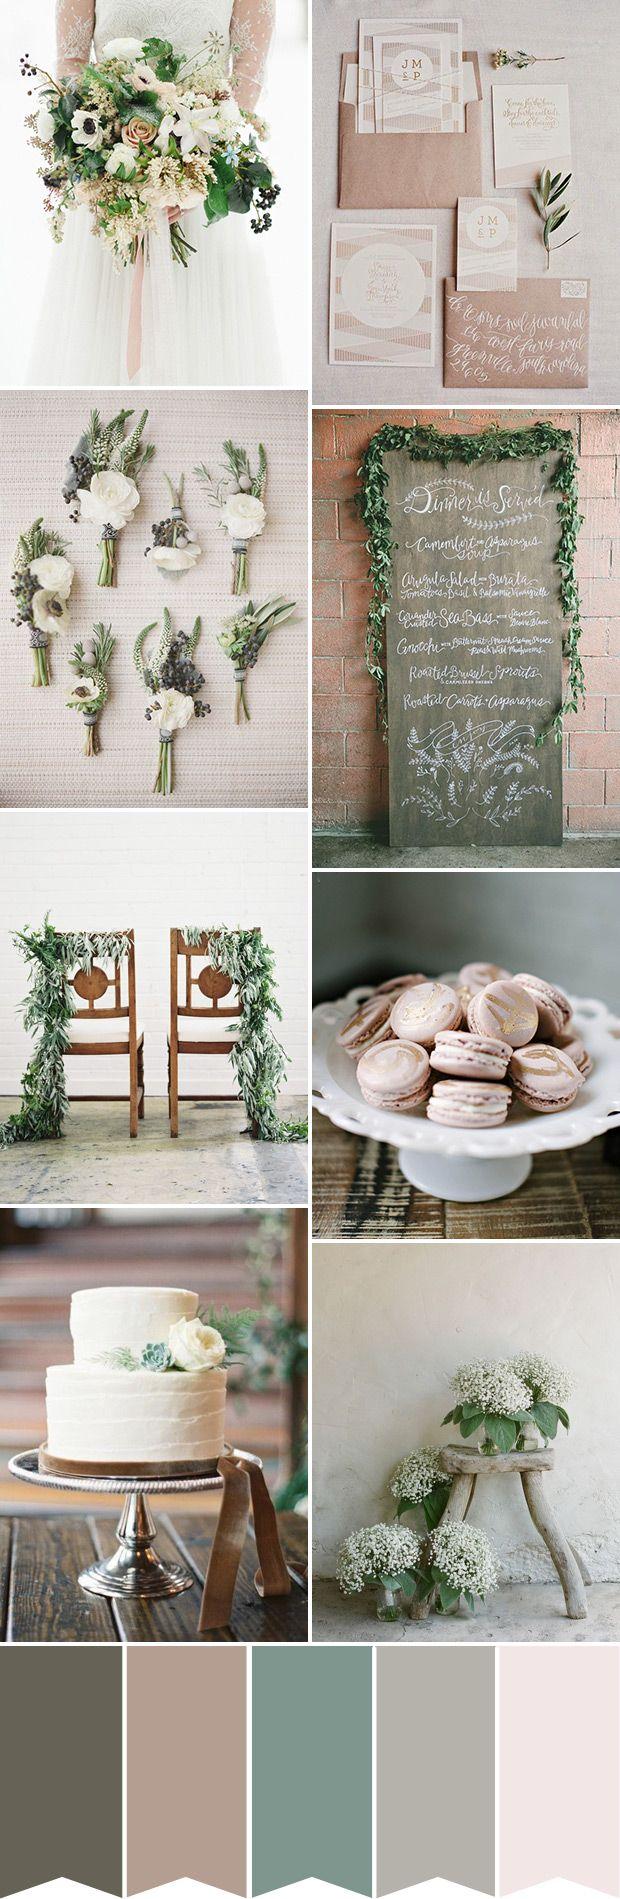 Natural Elegance A Beautiful Rustic Wedding Palette Onefabday Com Rustic Wedding Colors Wedding Colors Wedding Palette